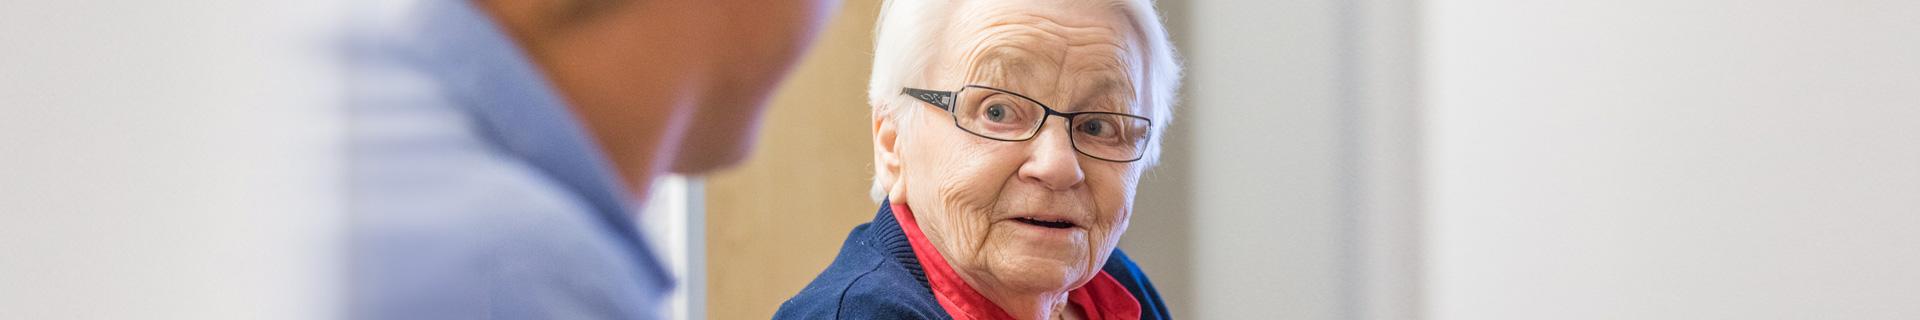 Ältere Frau schaut in die Kamera